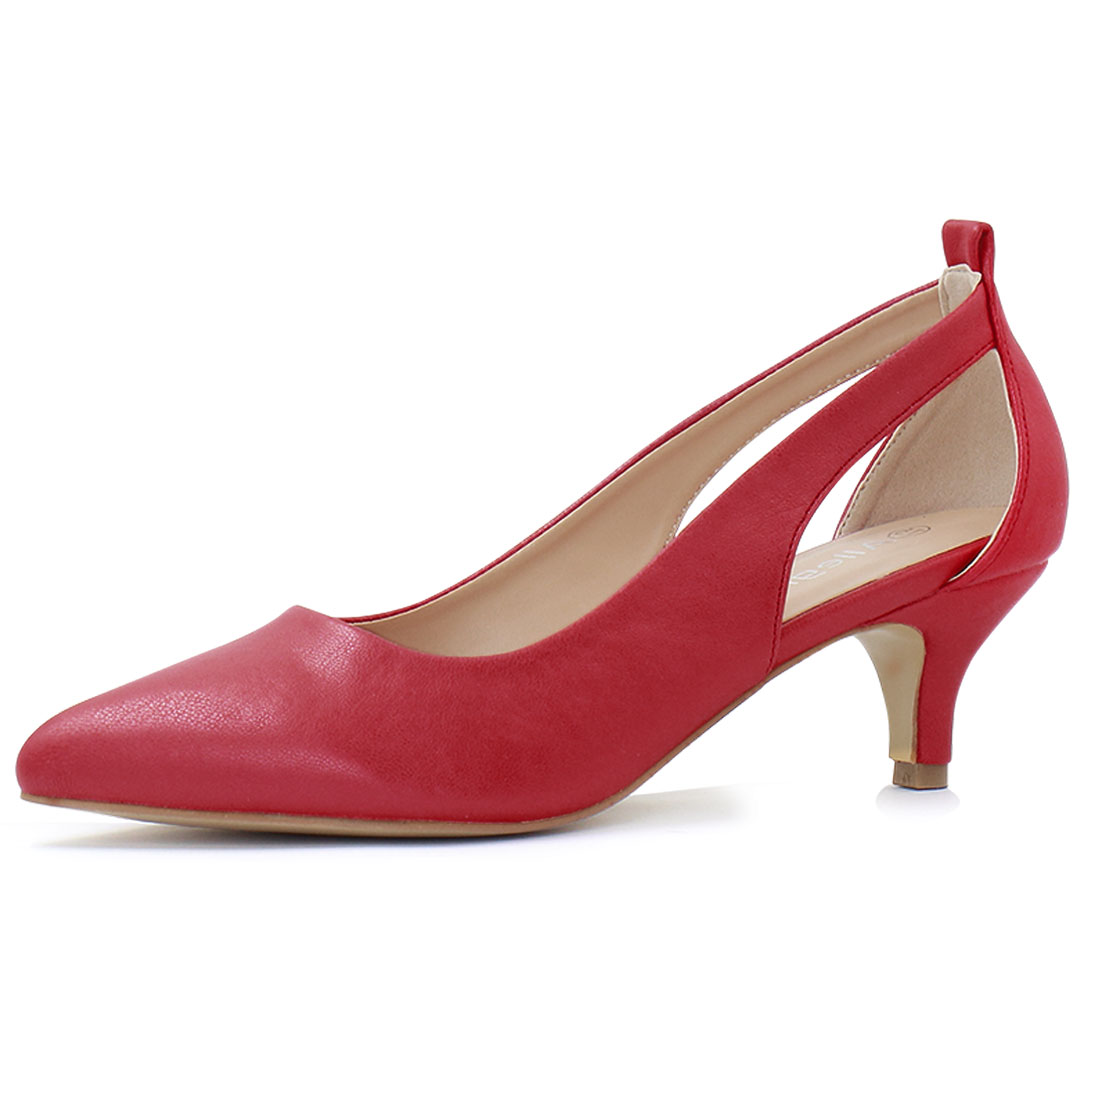 Allegra K Women's Cutout Sides Pointed Toe Kitten Heel Pumps Red US 8